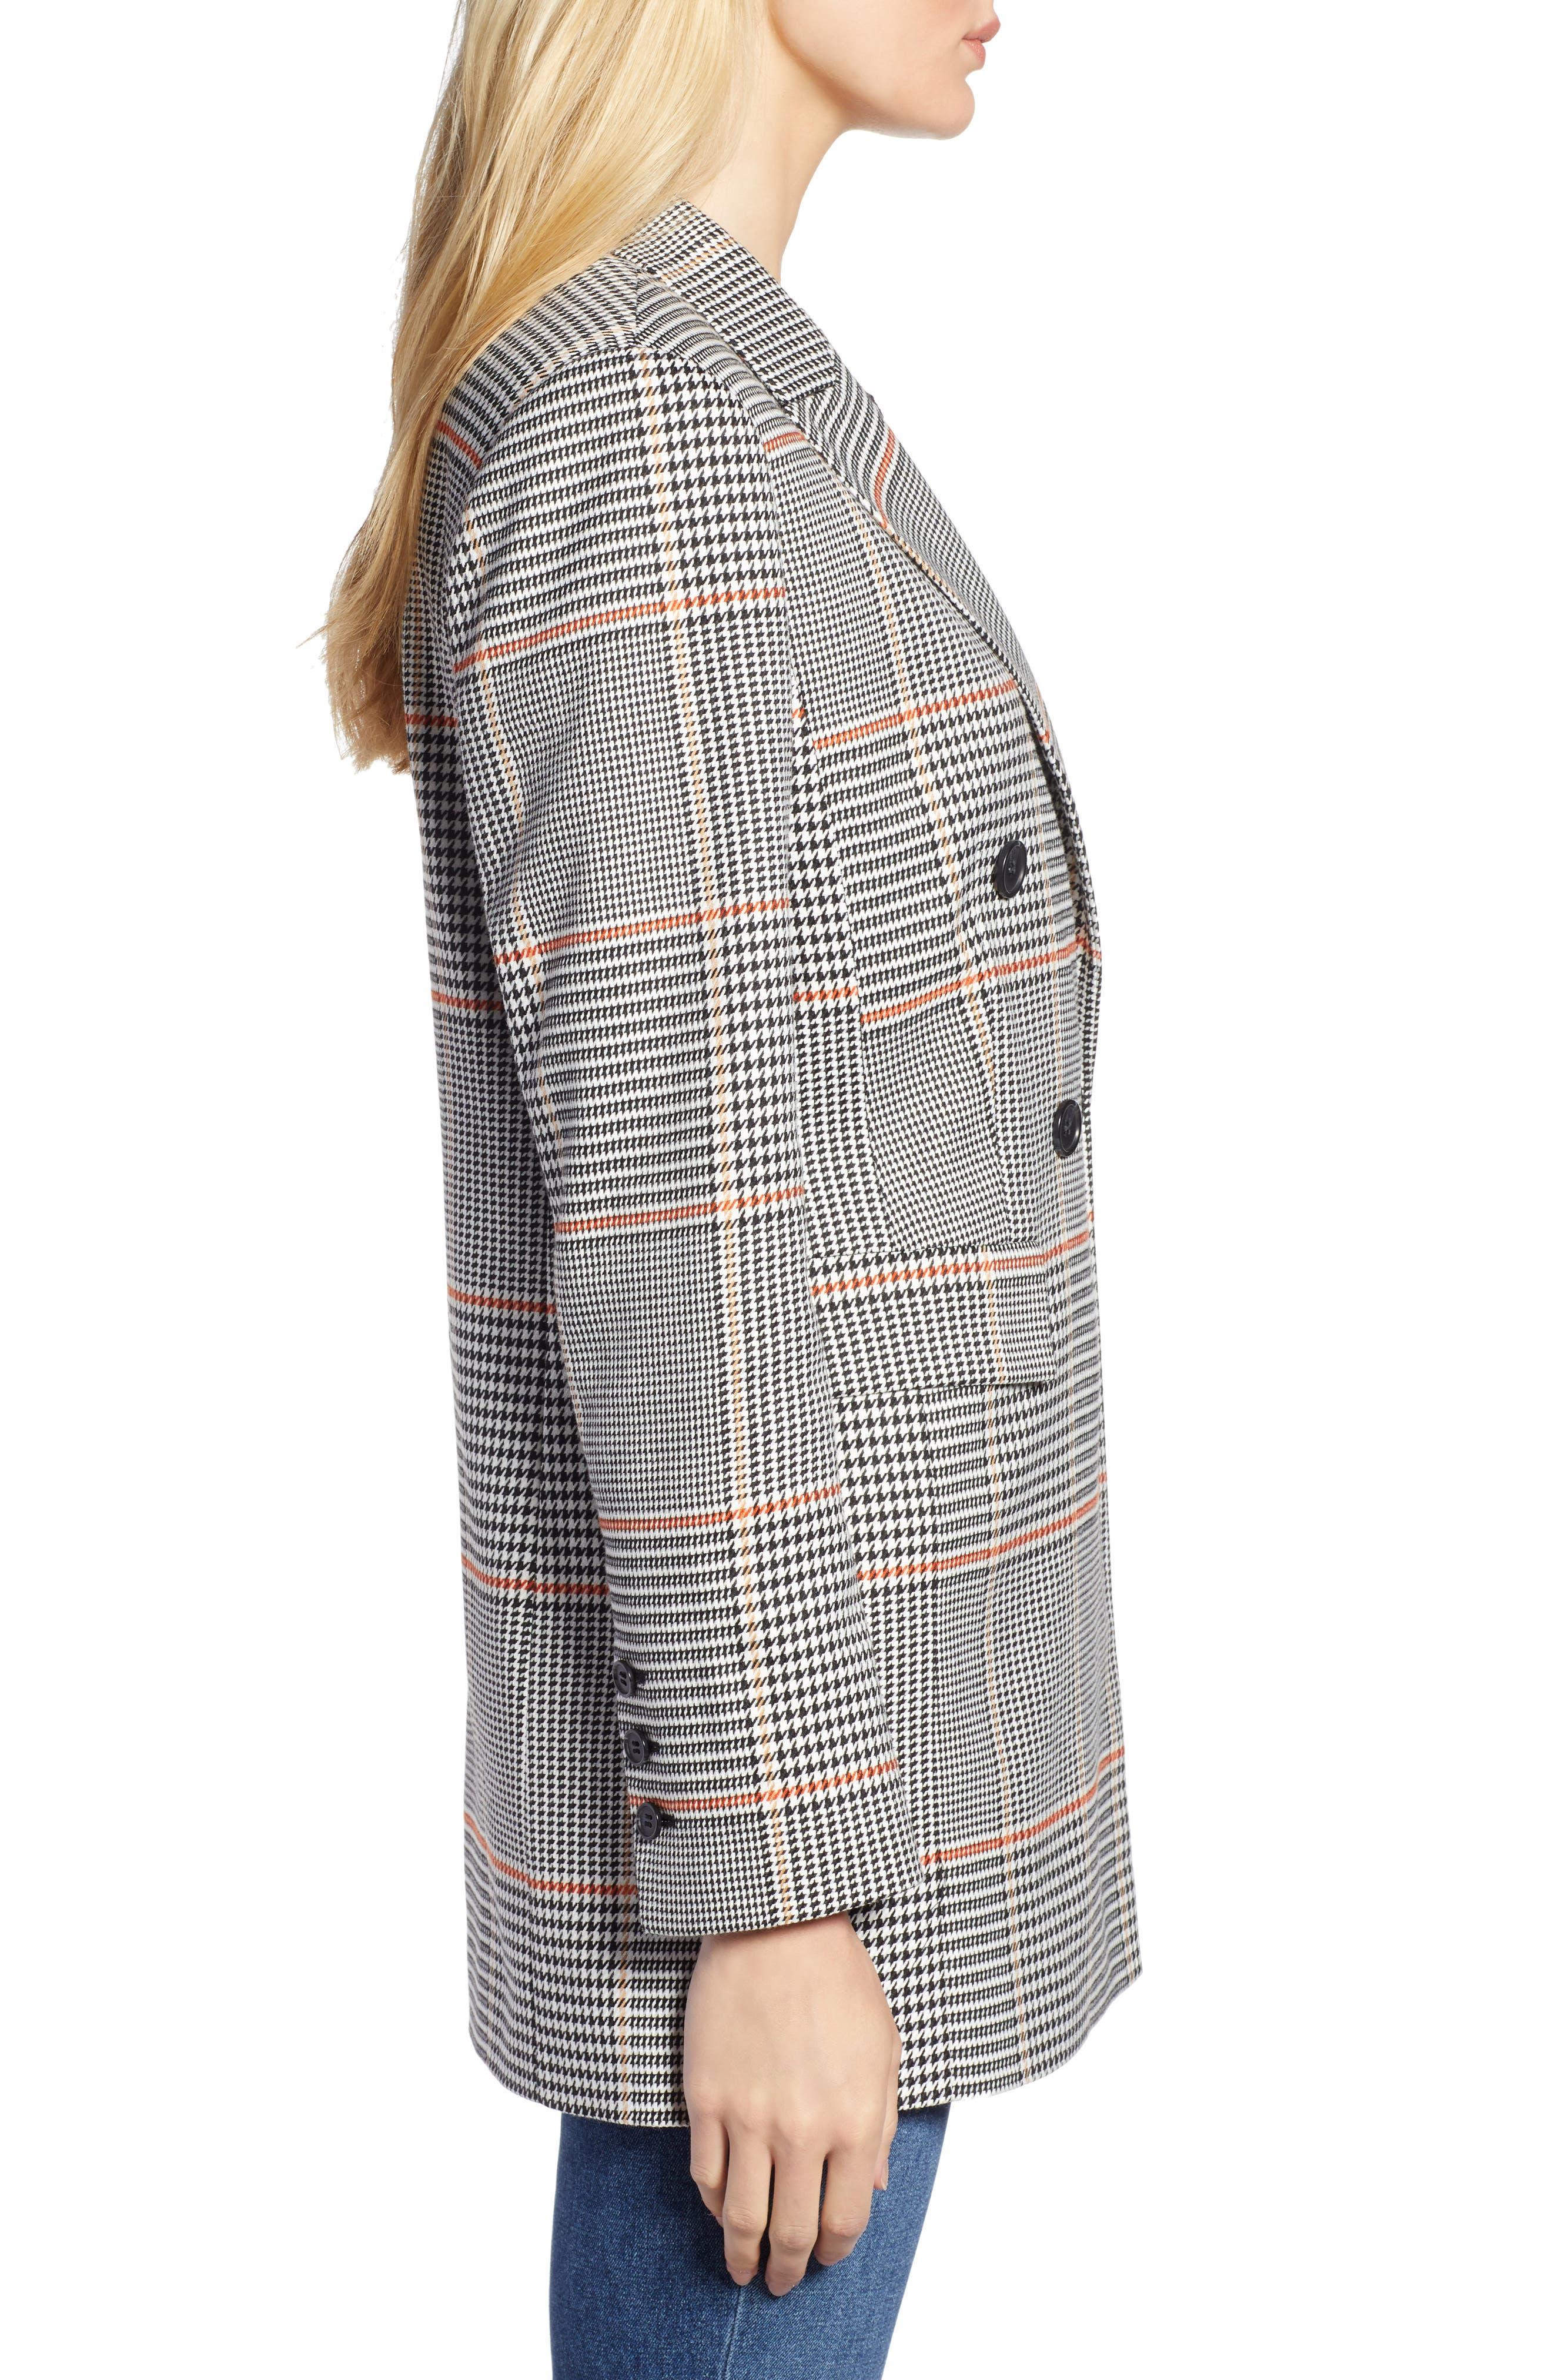 x Atlantic-Pacific Menswear Plaid Blazer,                             Alternate thumbnail 4, color,                             001